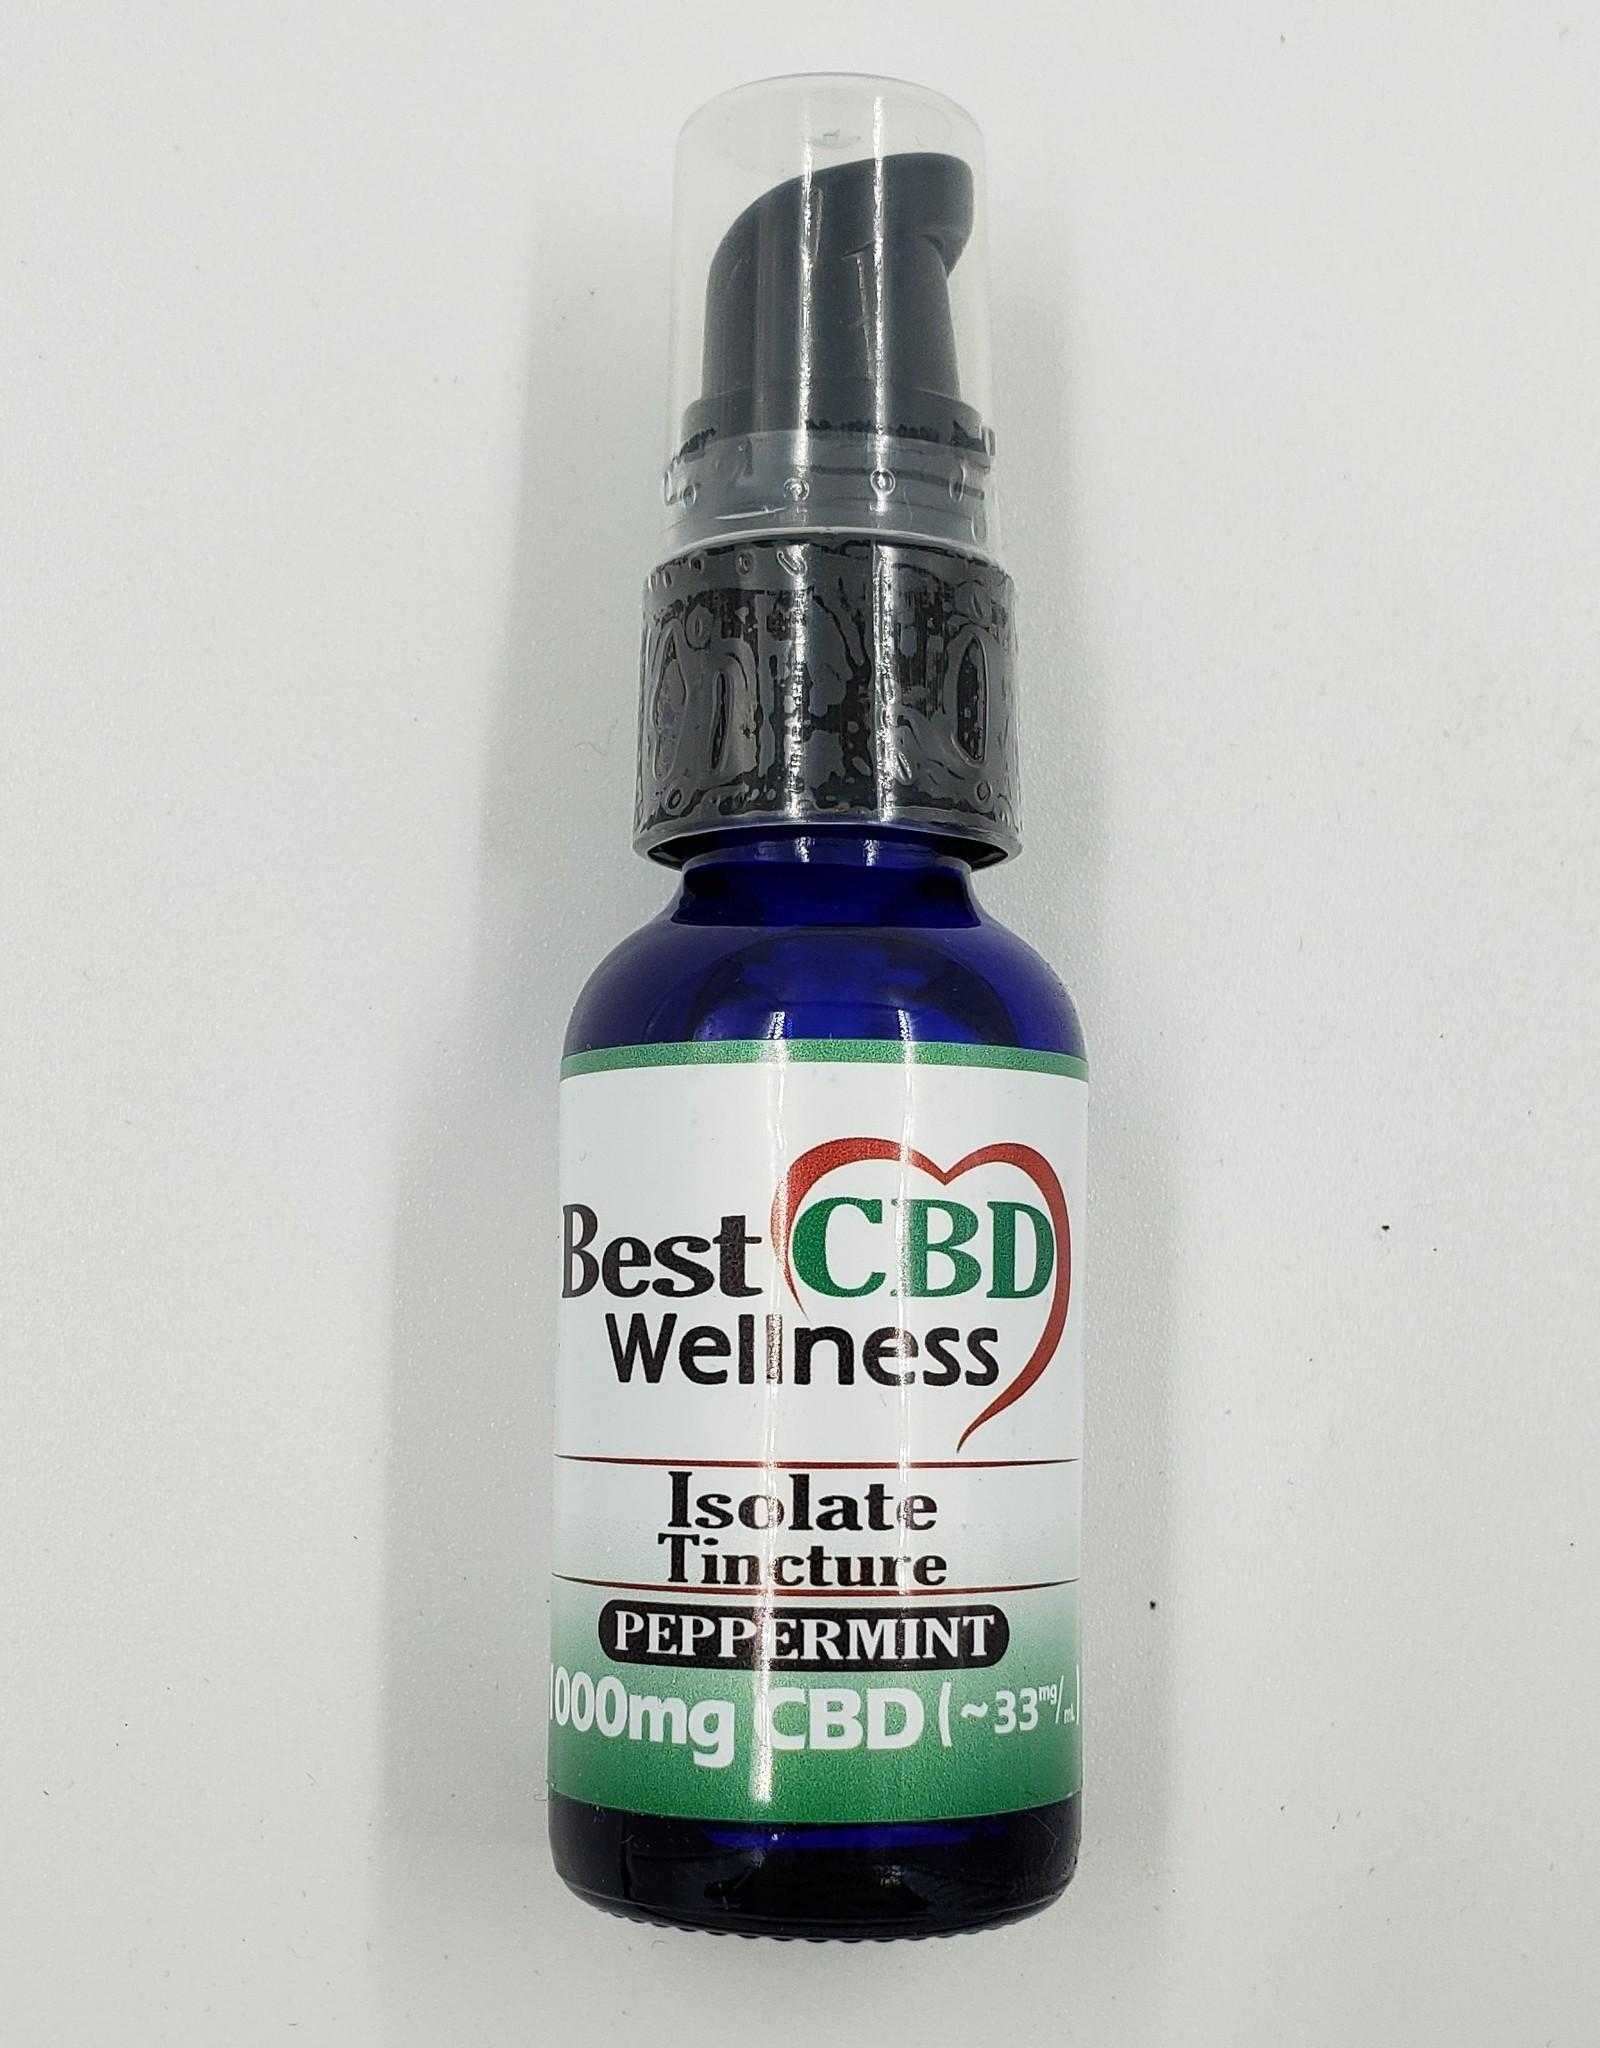 Best CBD Wellness Isolate Oil Tincture 1000mg Peppermint